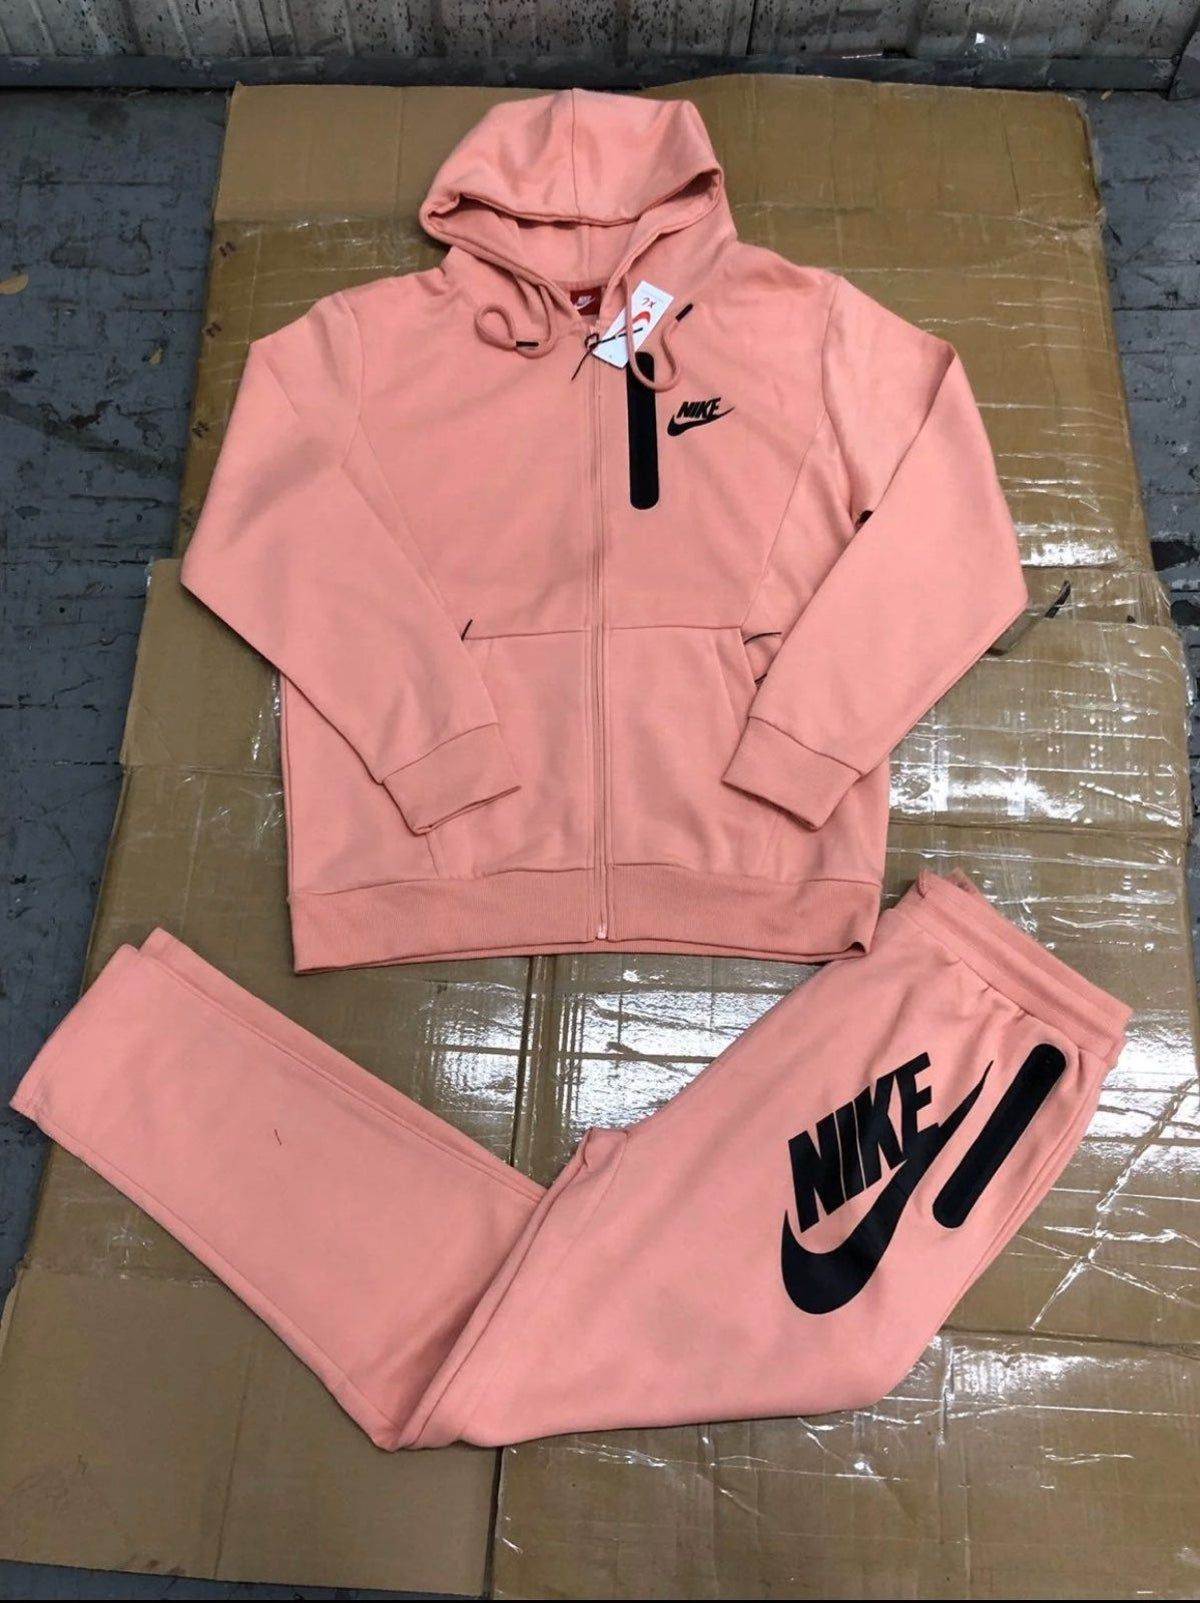 Unisex 3XL Nike Sweatsuit | Cute nike outfits, Hype clothing ...